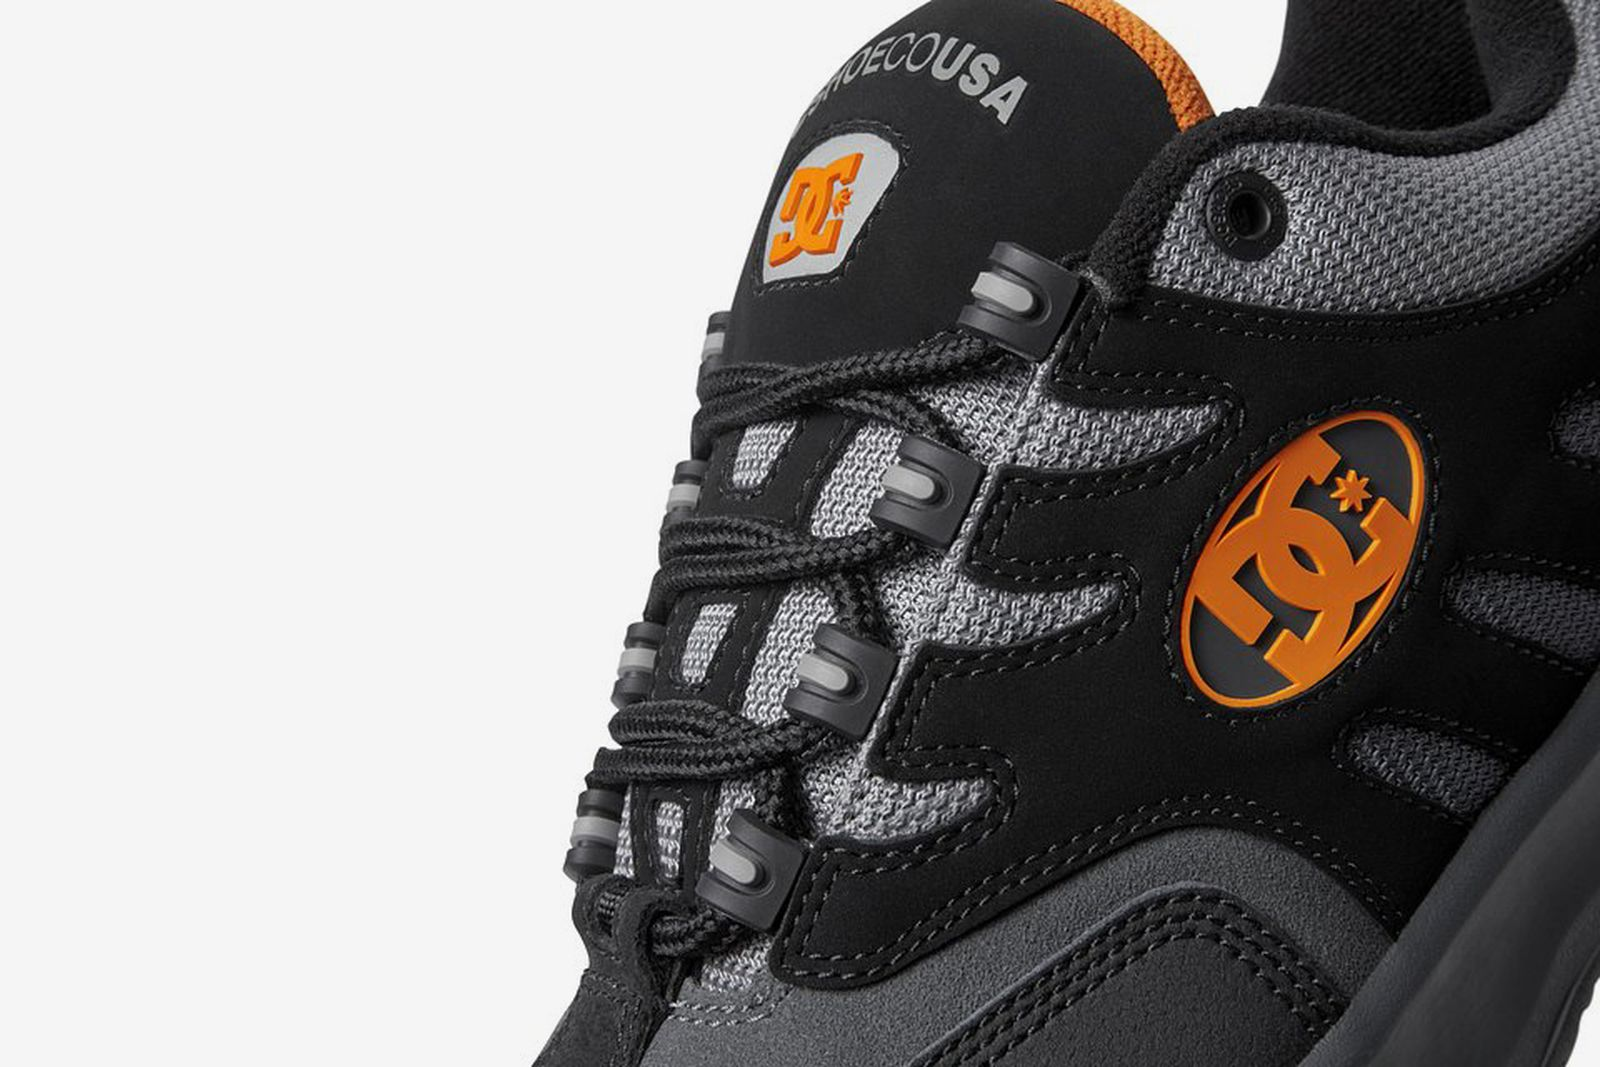 dc-shoes-lukoda-og-black-charcoal-release-date-price-07